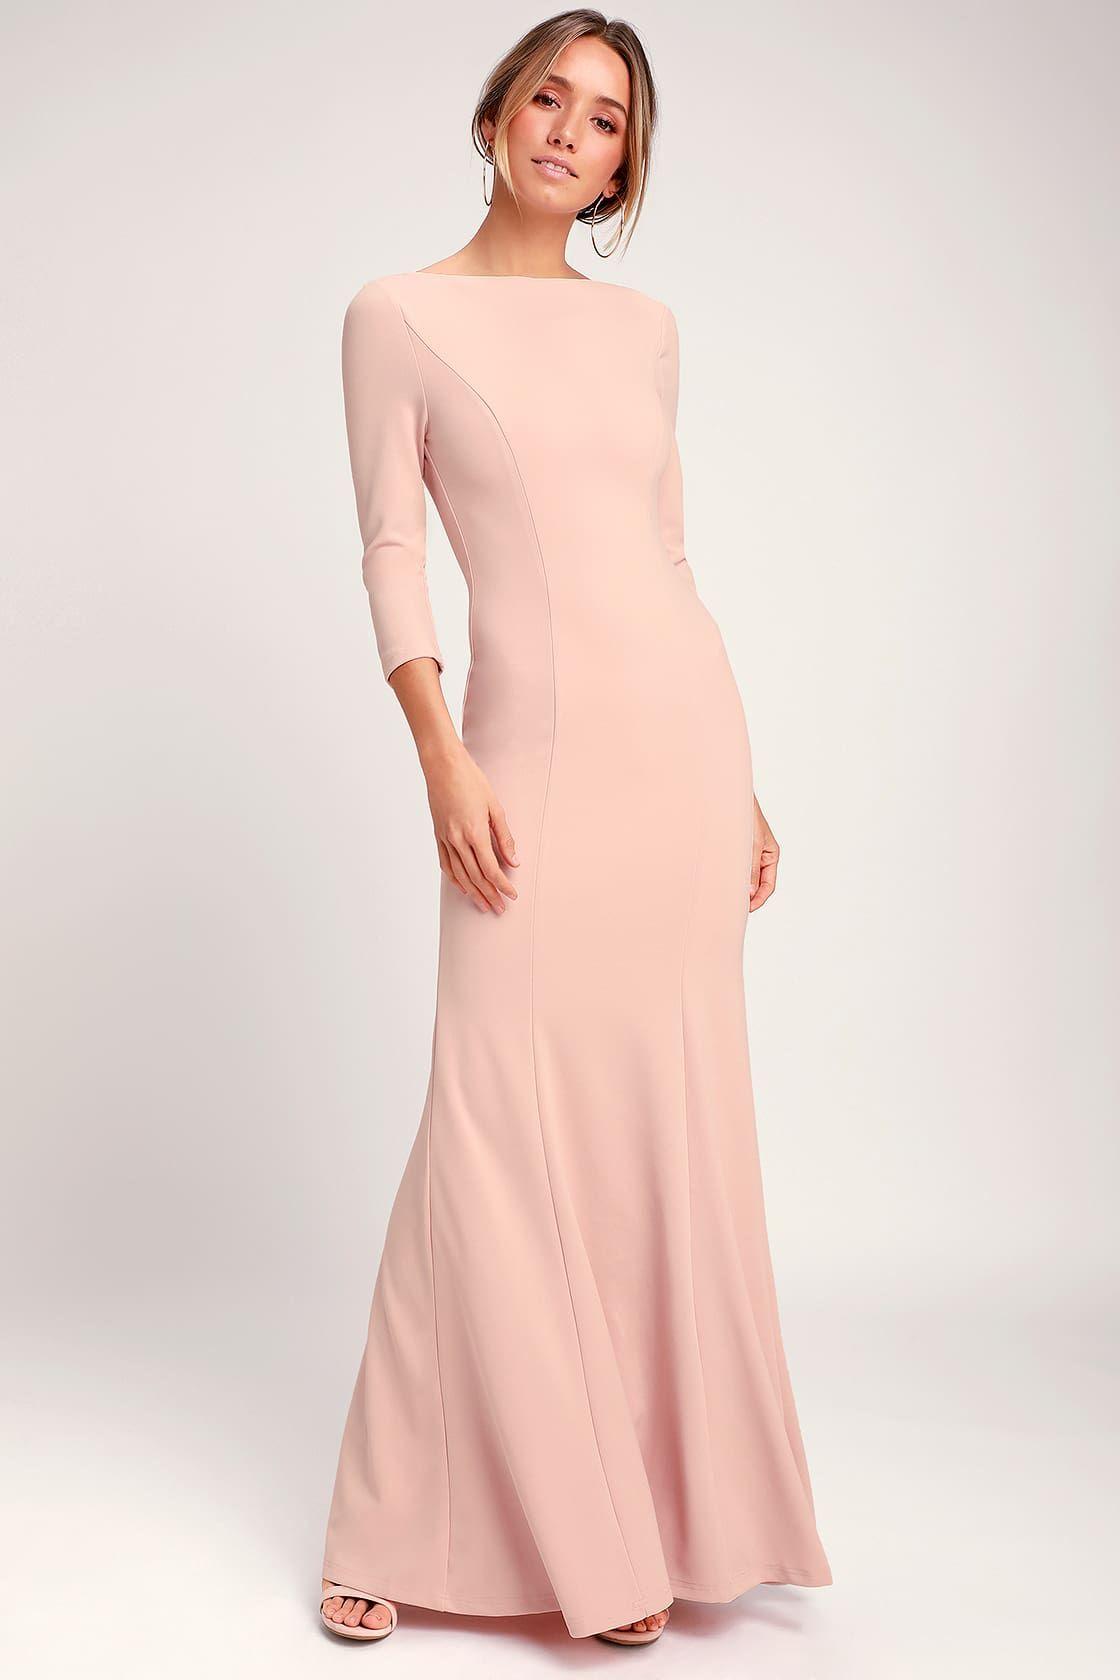 Glamour galore blush pink button back maxi dress long